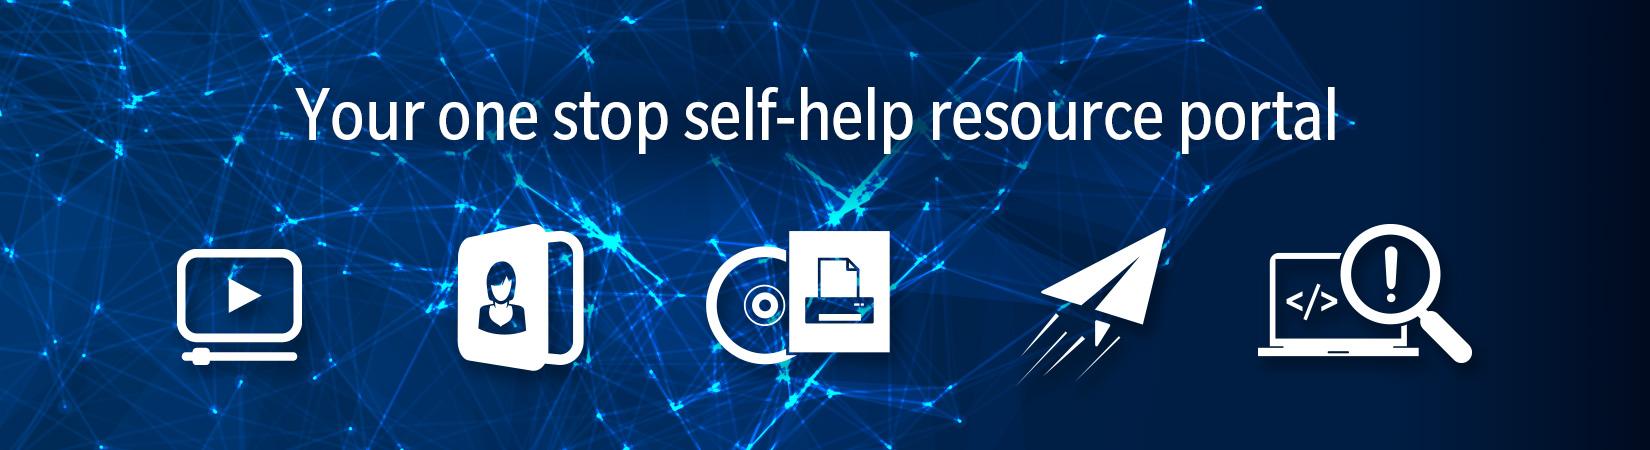 km+ one stop self help